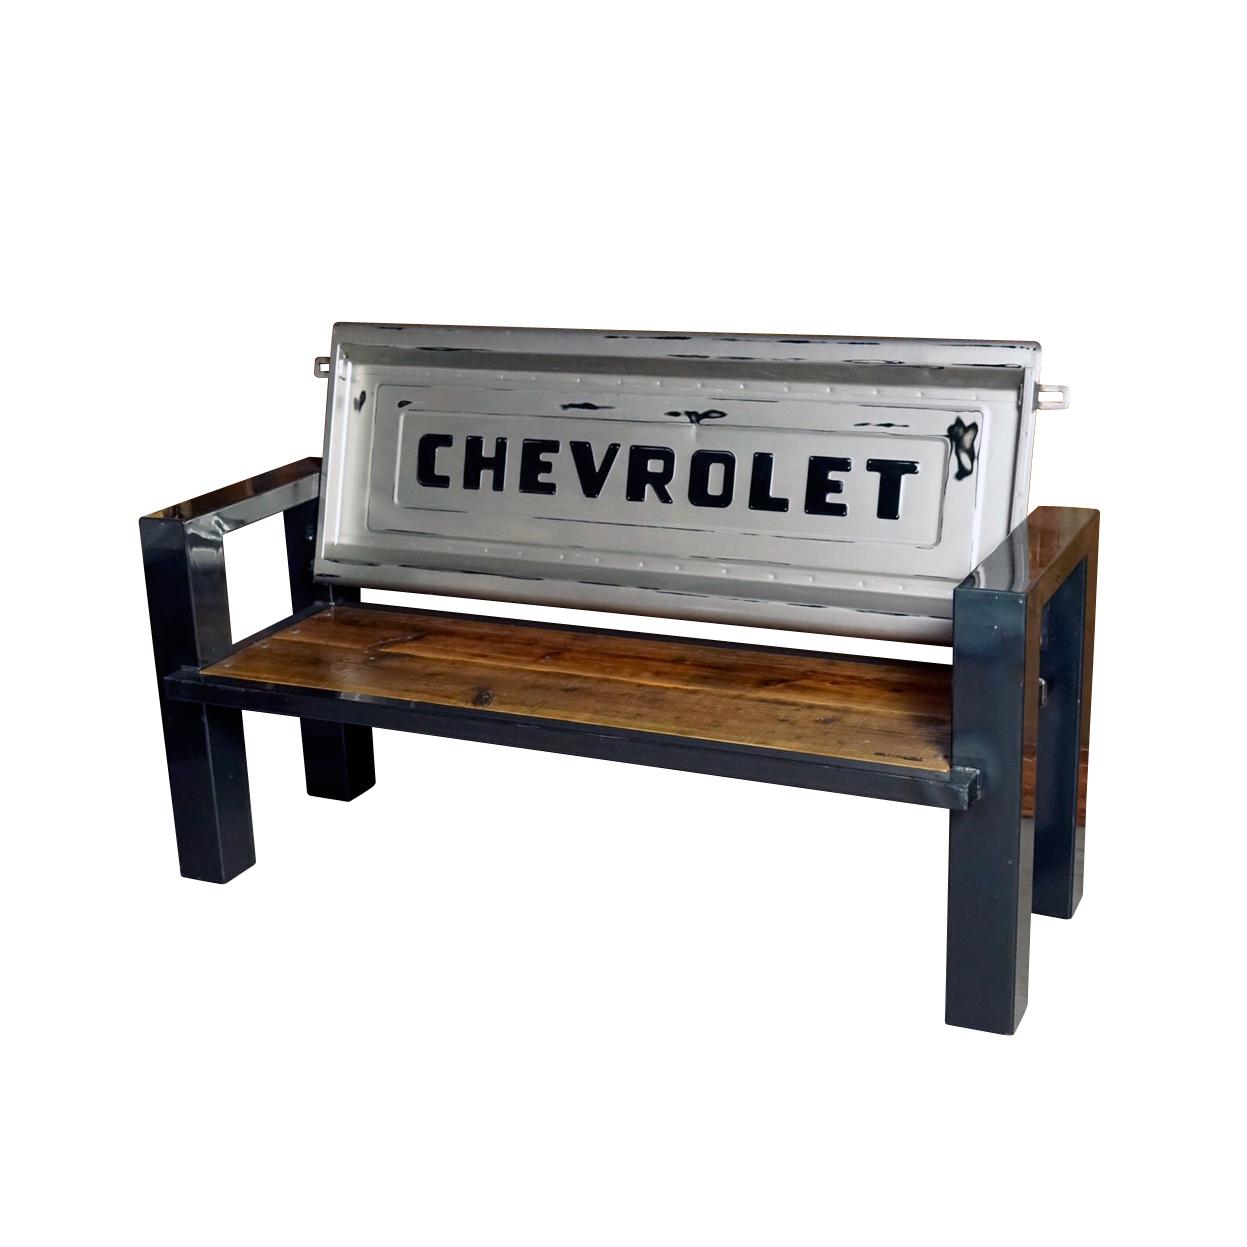 M-LINE CHEVROLET TAILGATE BENCH 【WOOD】テールゲートベンチ